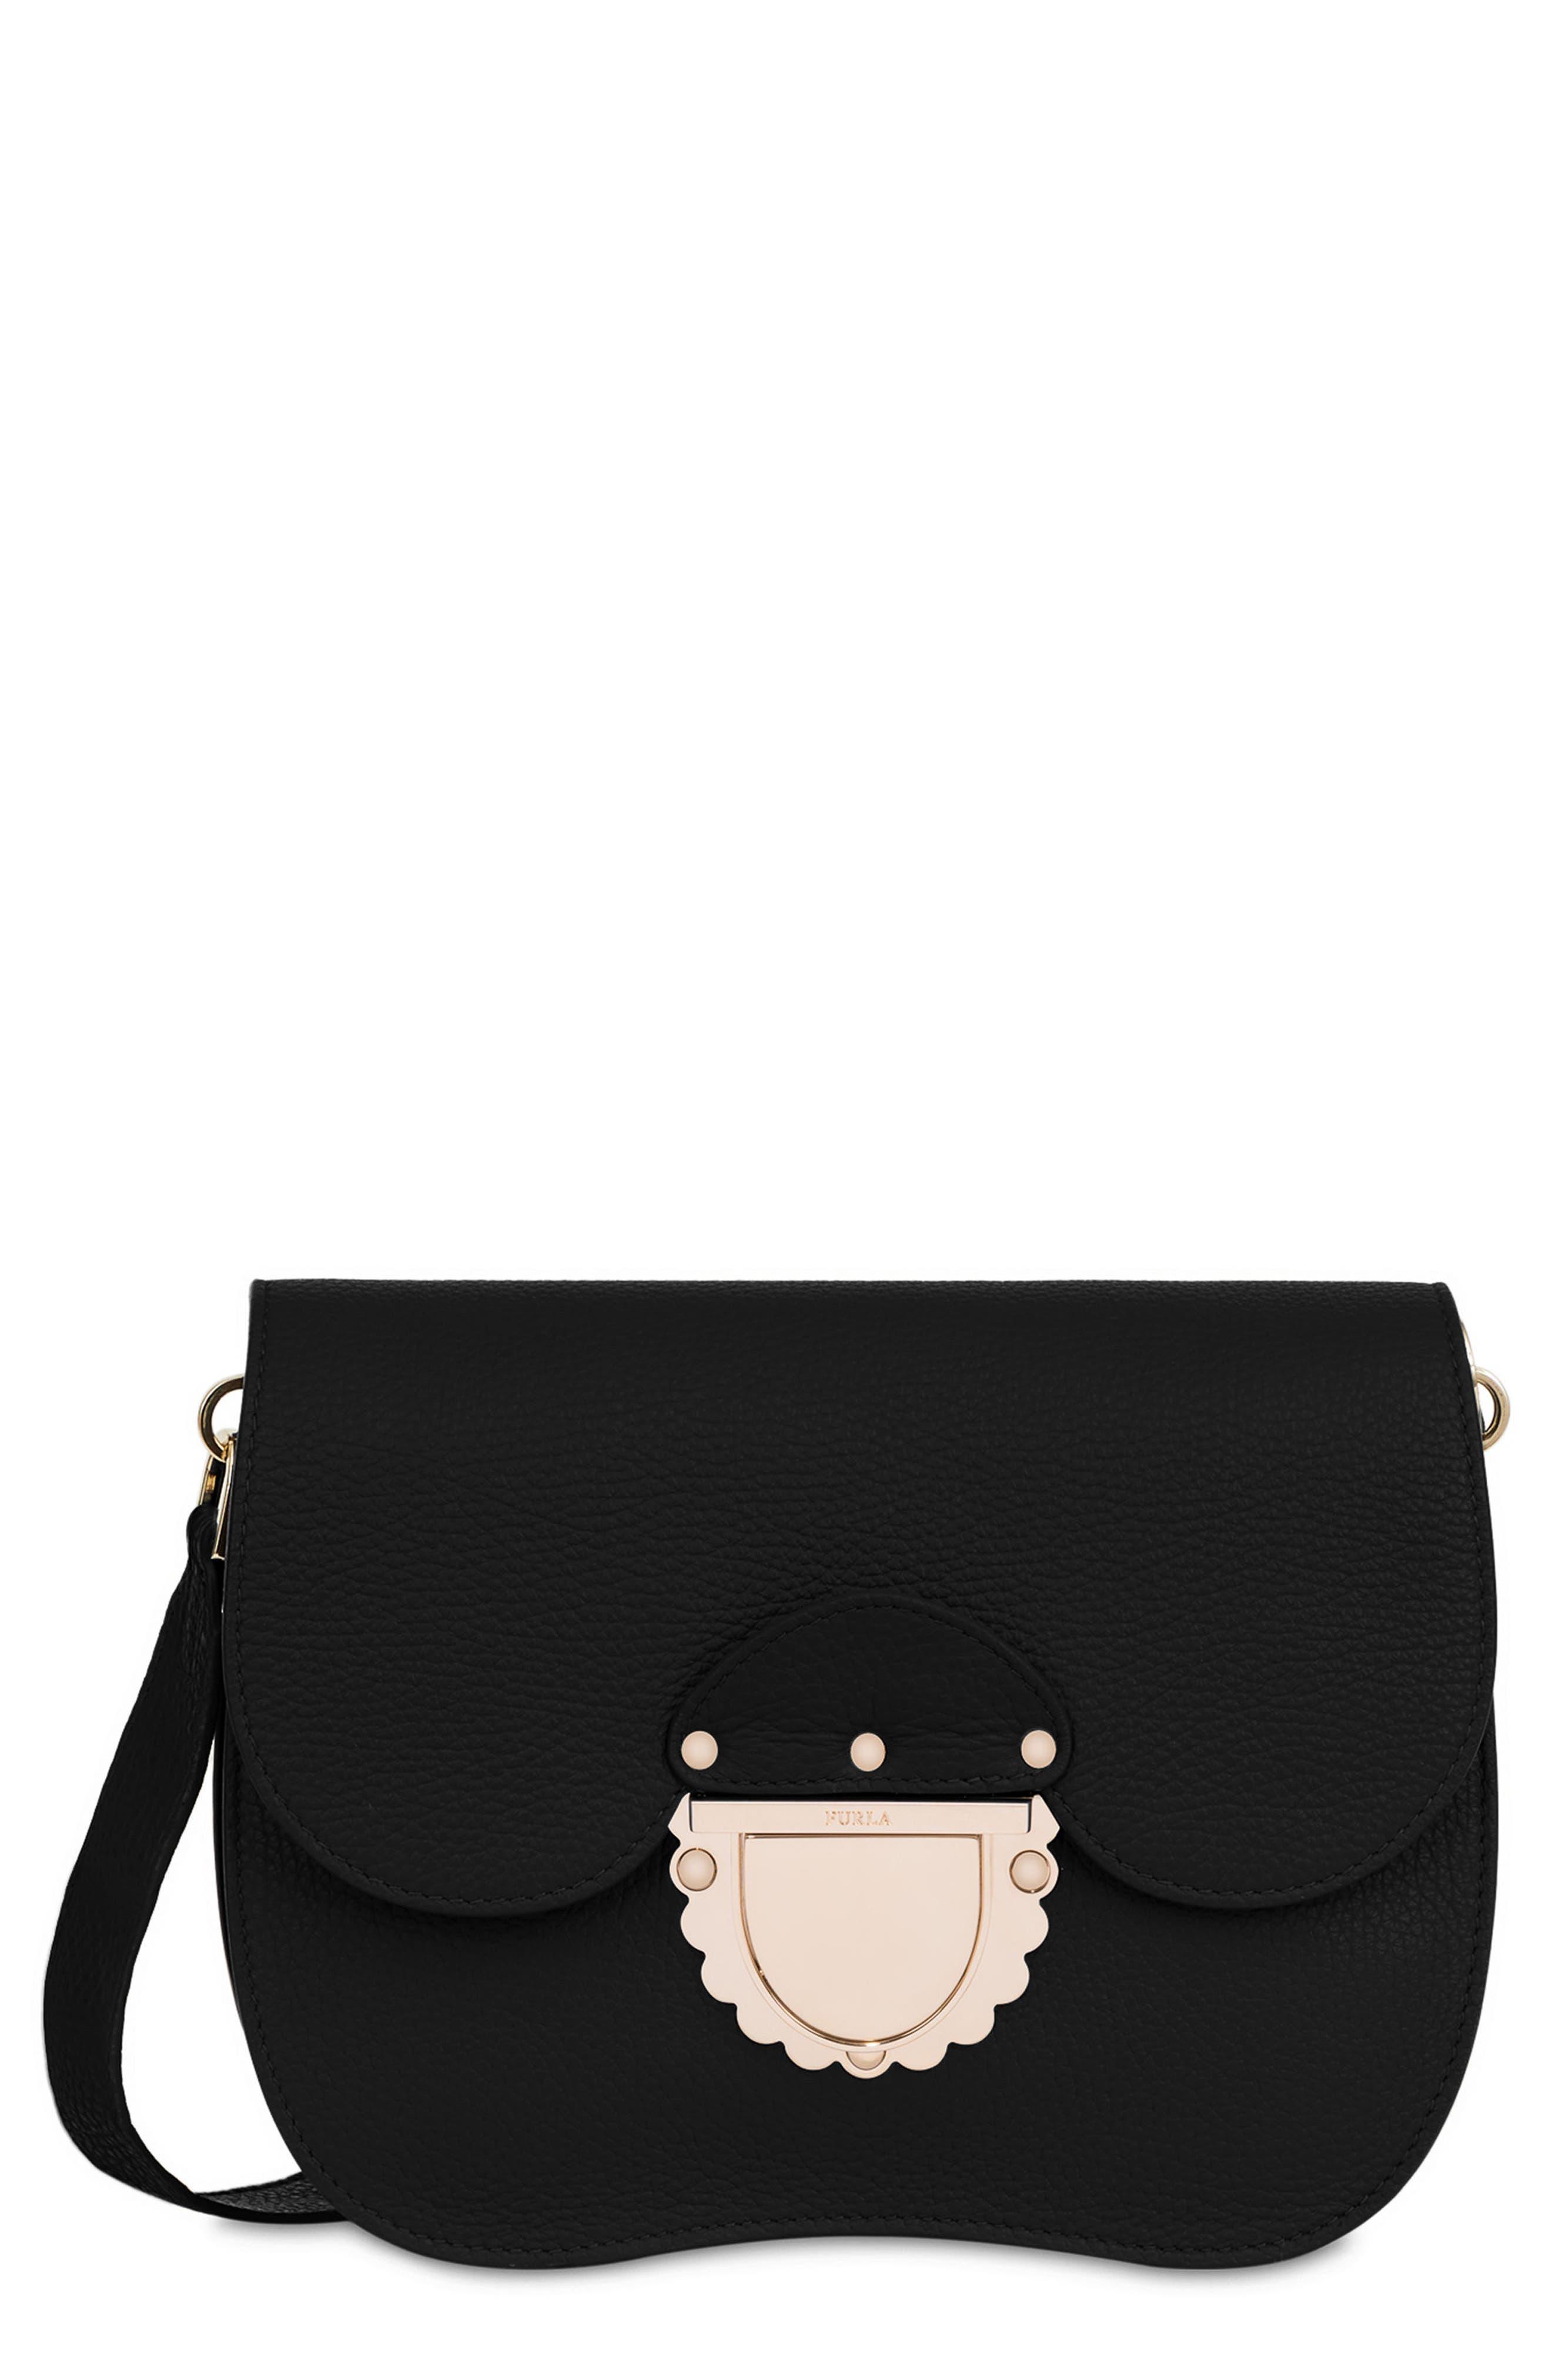 FURLA Small Metropolis Leather Crossbody Bag, Main, color, 001